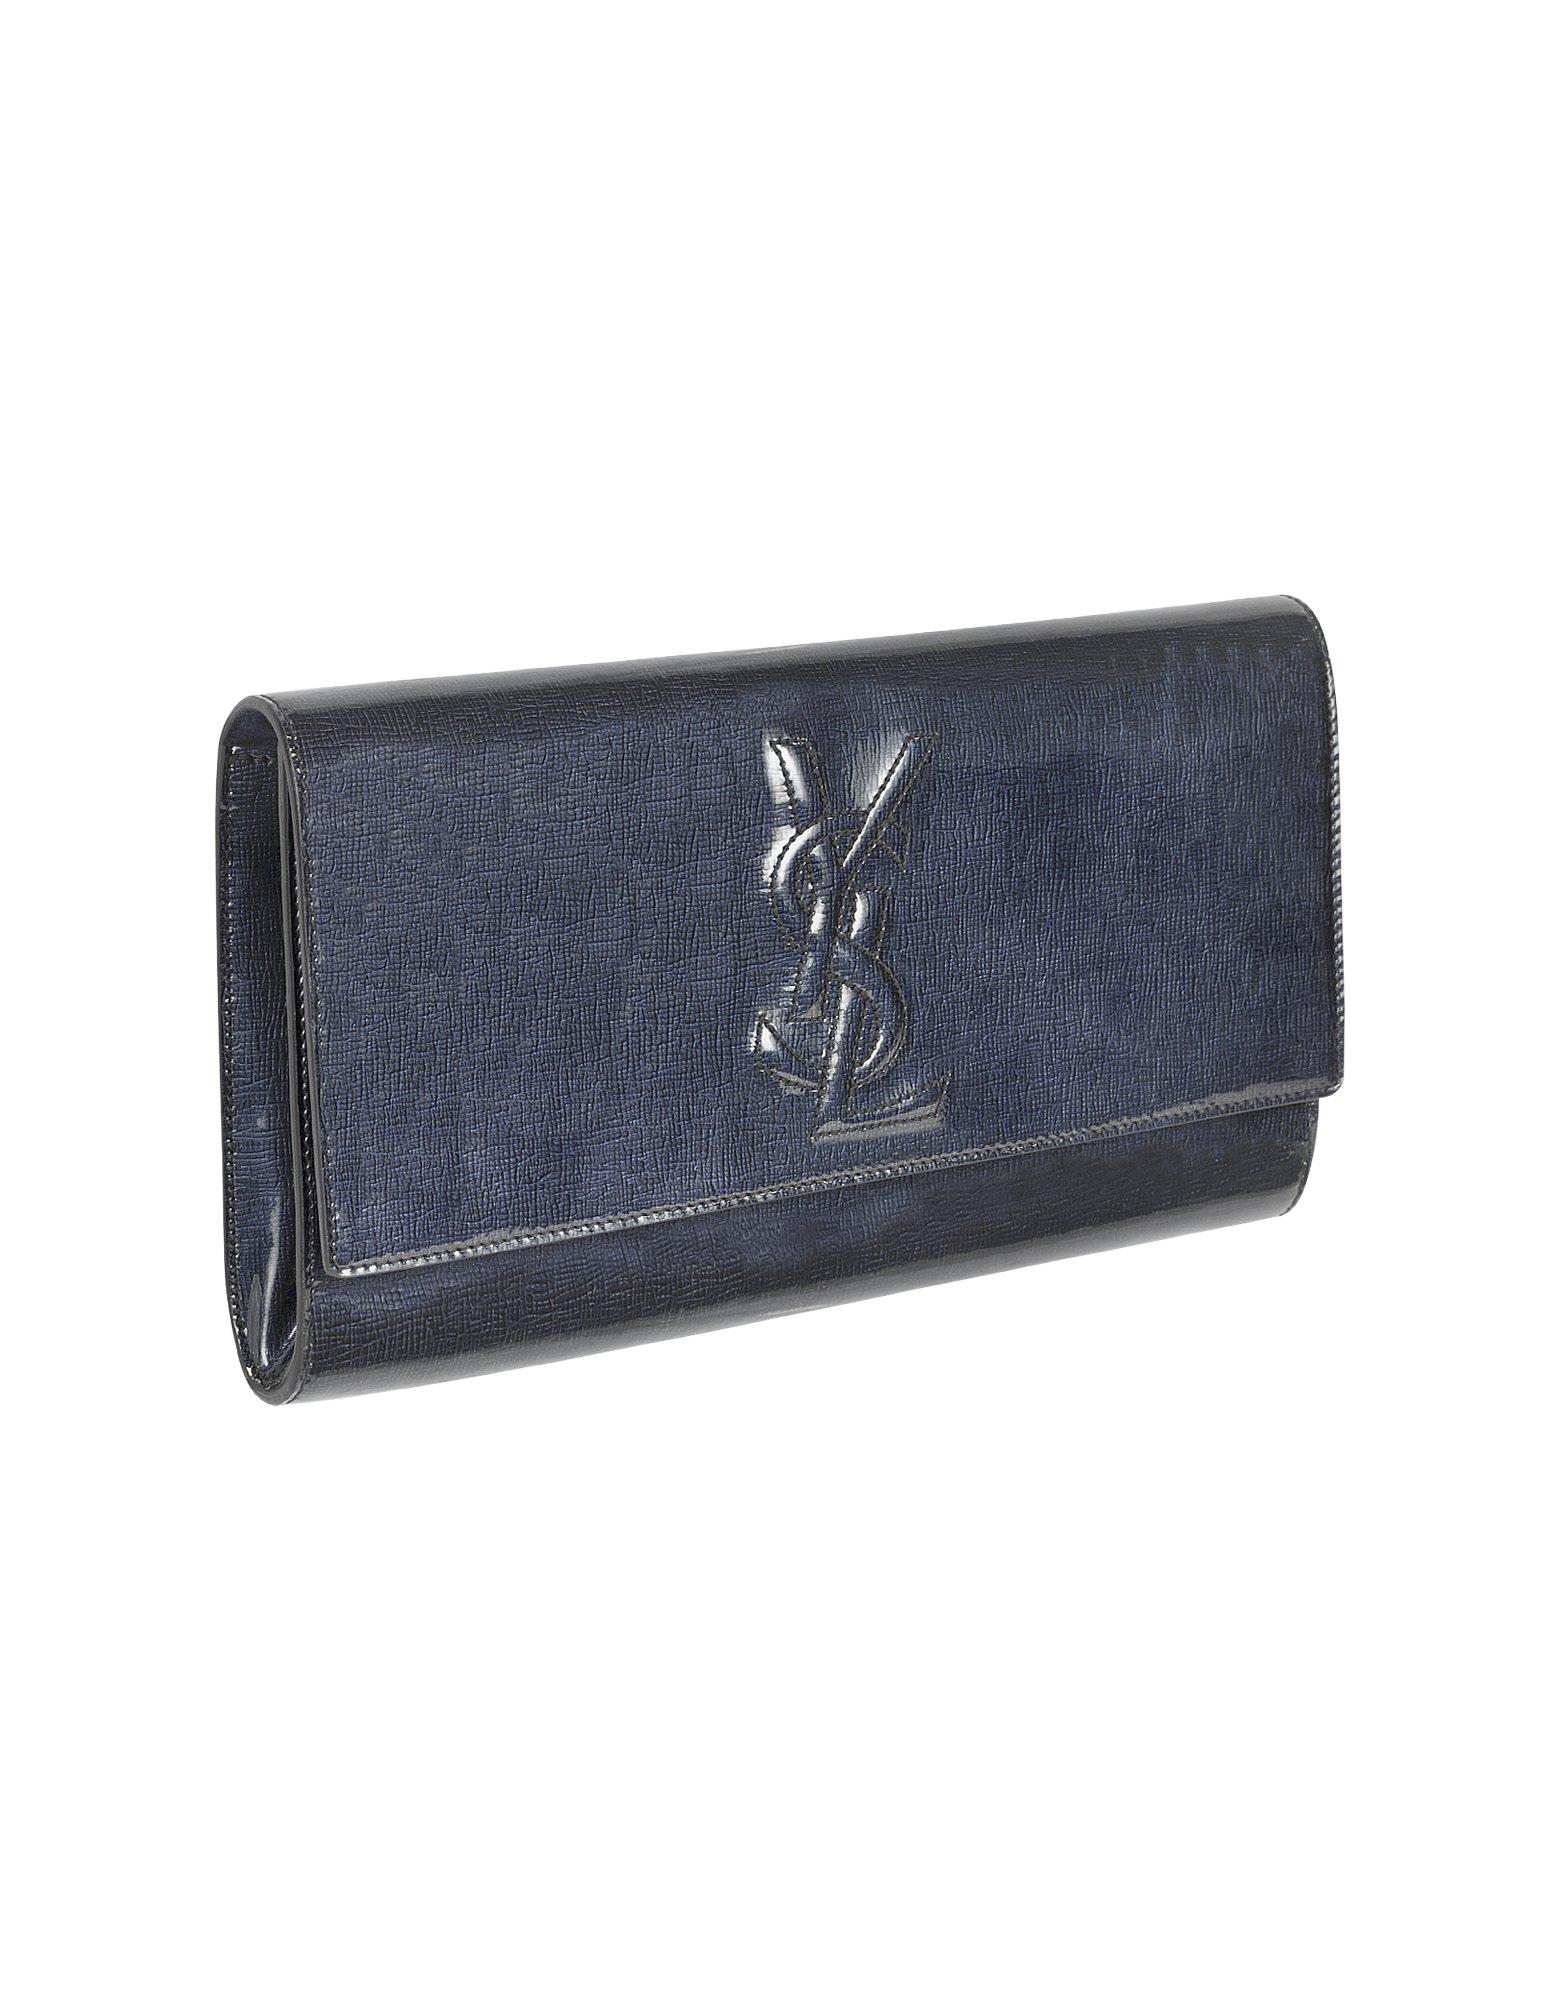 Saint laurent Large Logo Patent Leather Clutch in Blue (multi) | Lyst